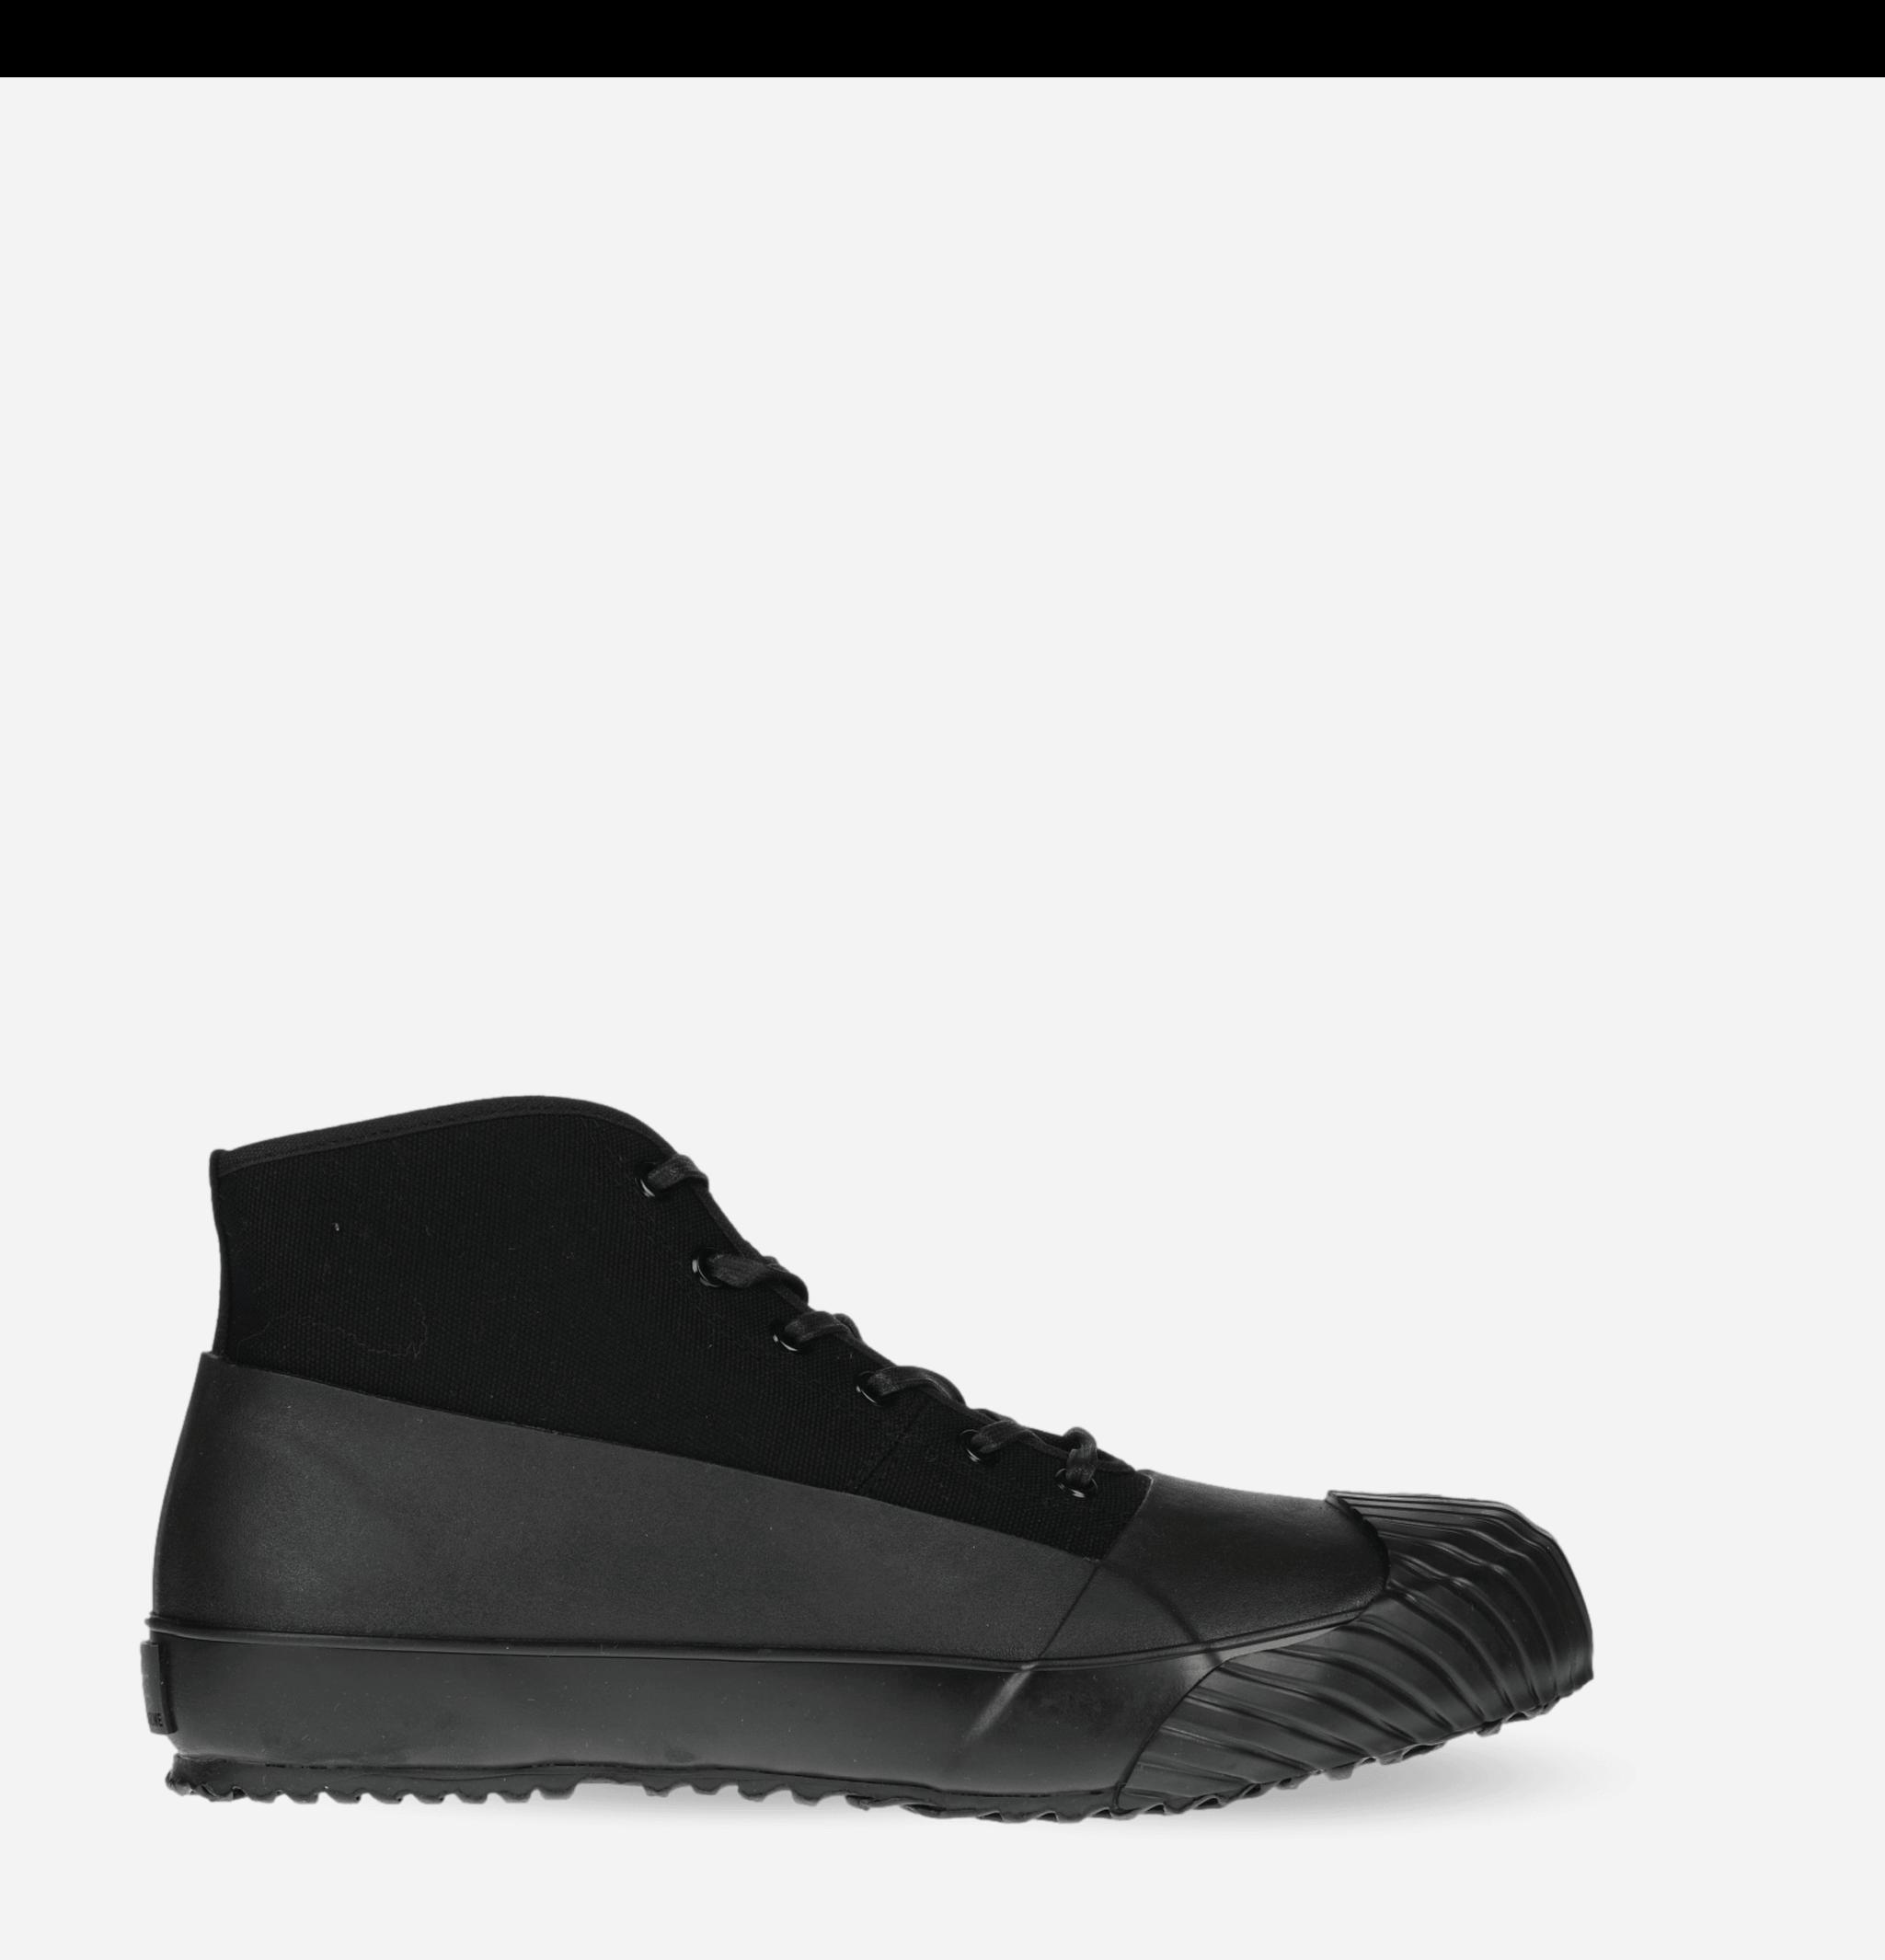 Allweather Boots Black